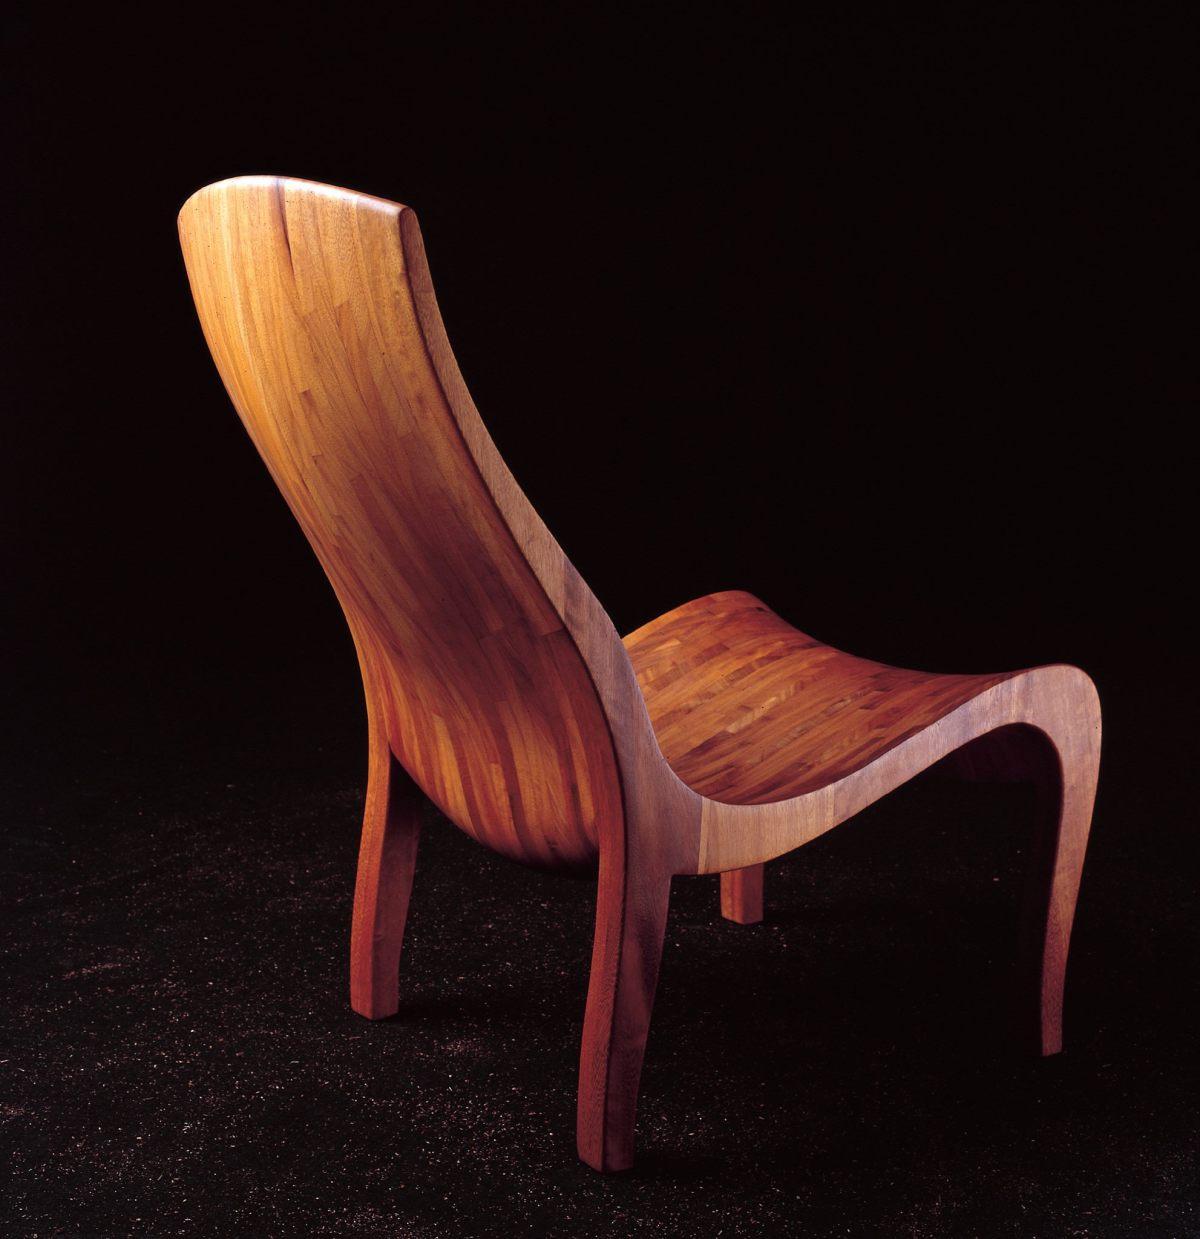 Rampel Designs – Legacy Furniture in Kenya